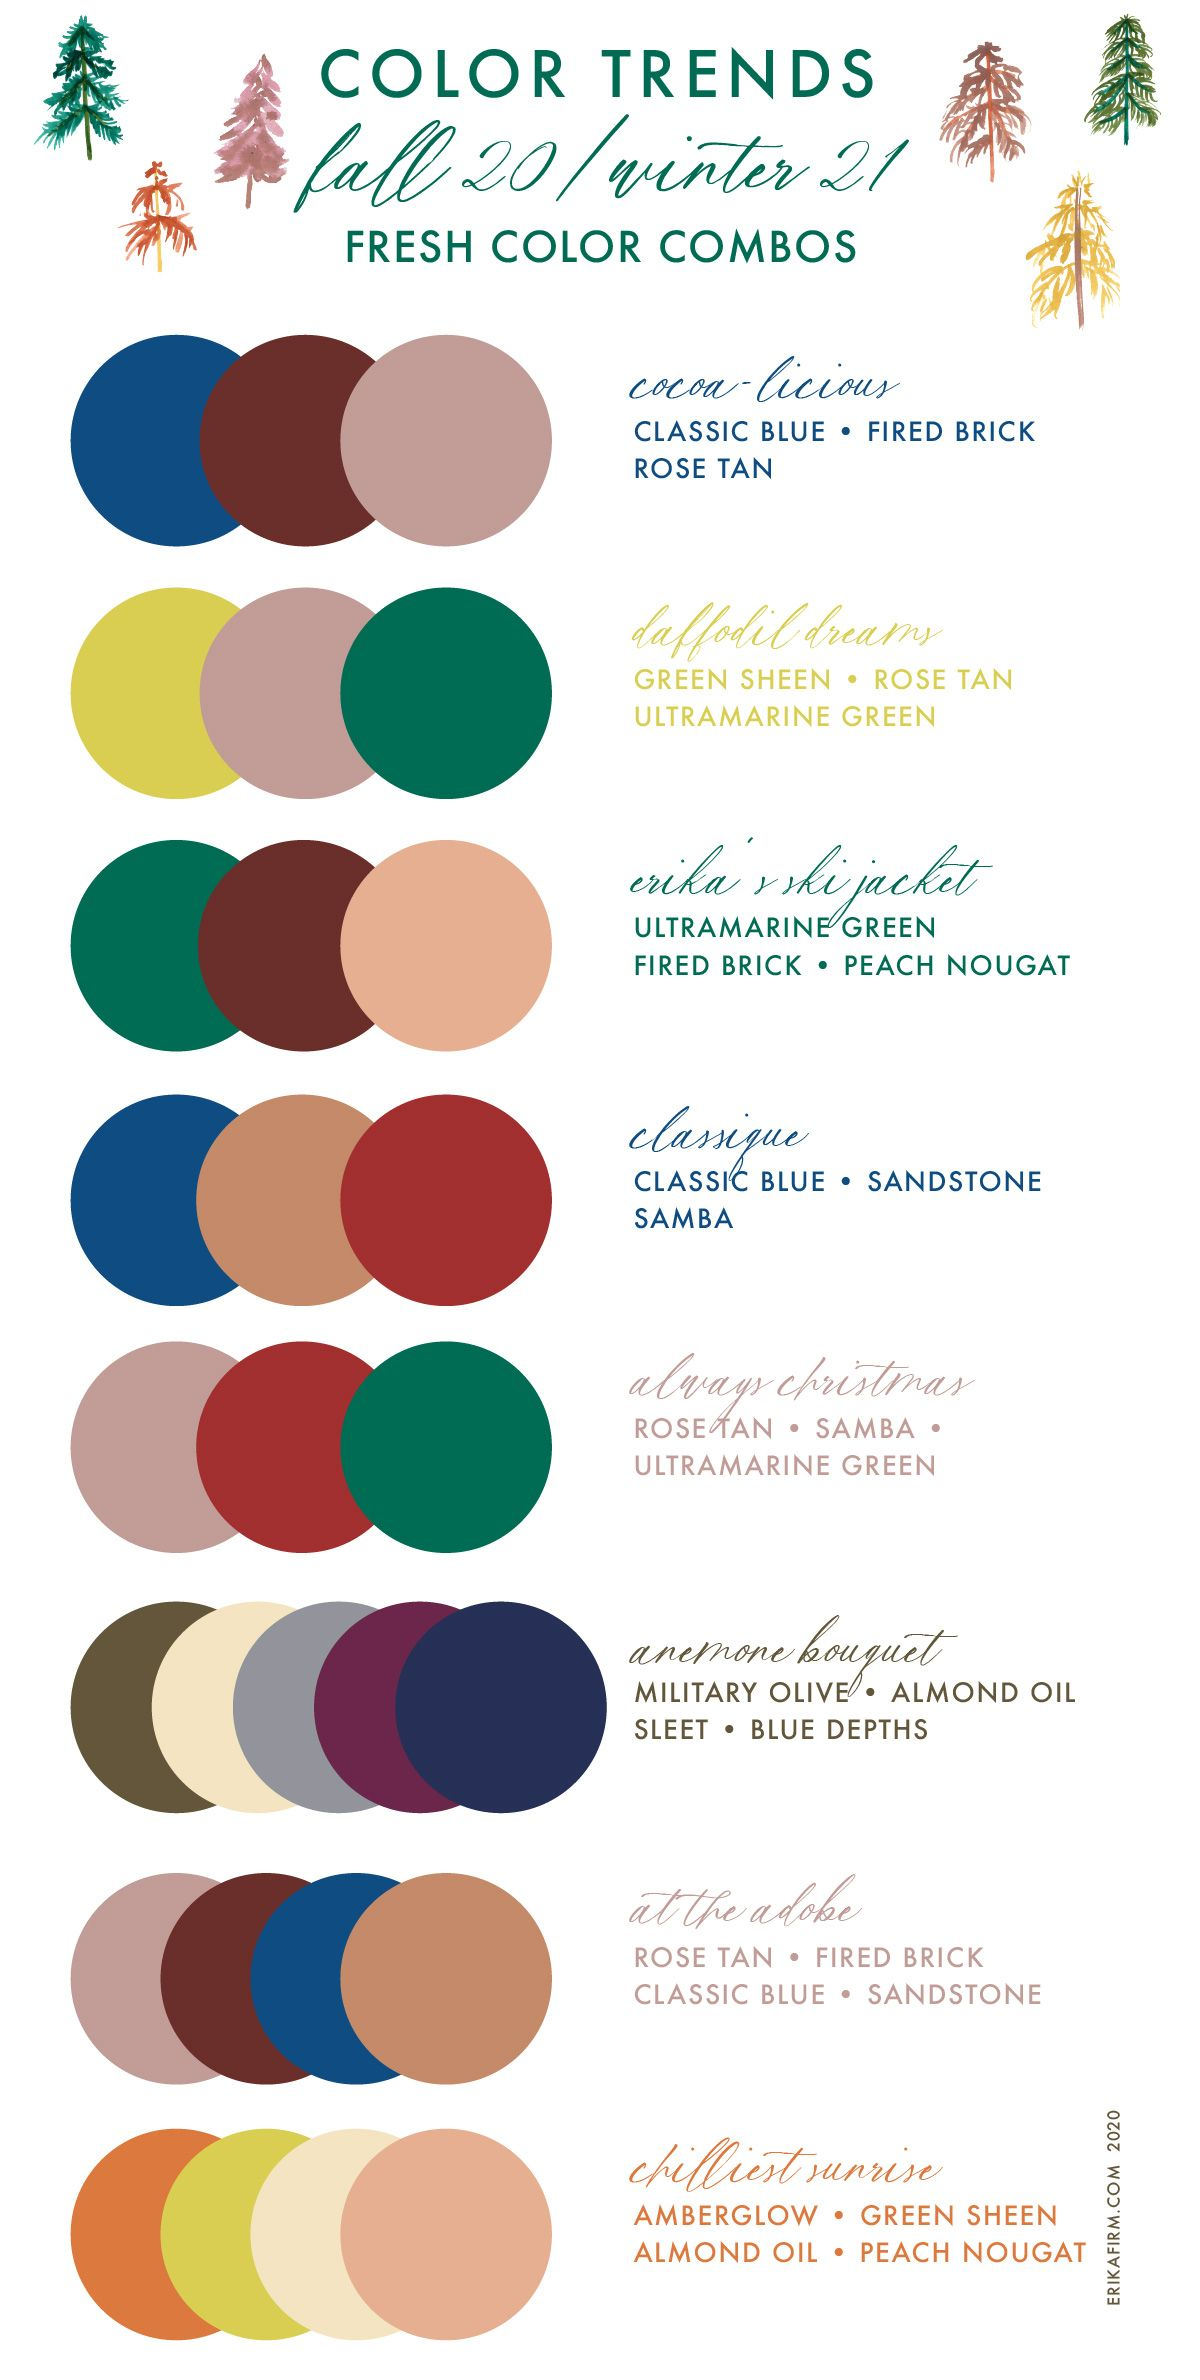 Fall 2020 Winter 2021 Pantone Colors Trends